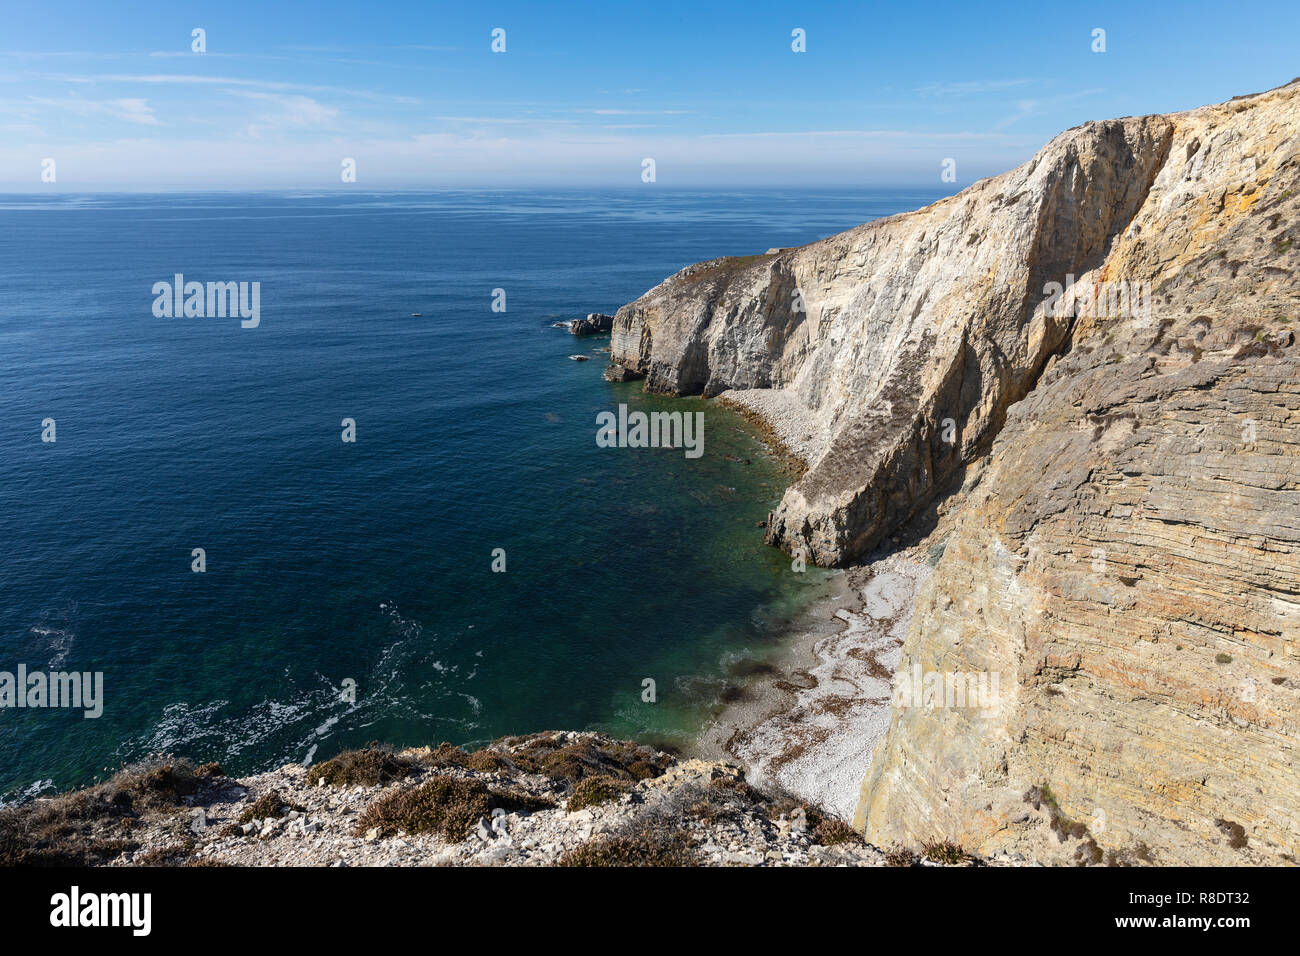 Cap de la Chevre on the Crozon peninsula (Finistere, France) - Stock Image